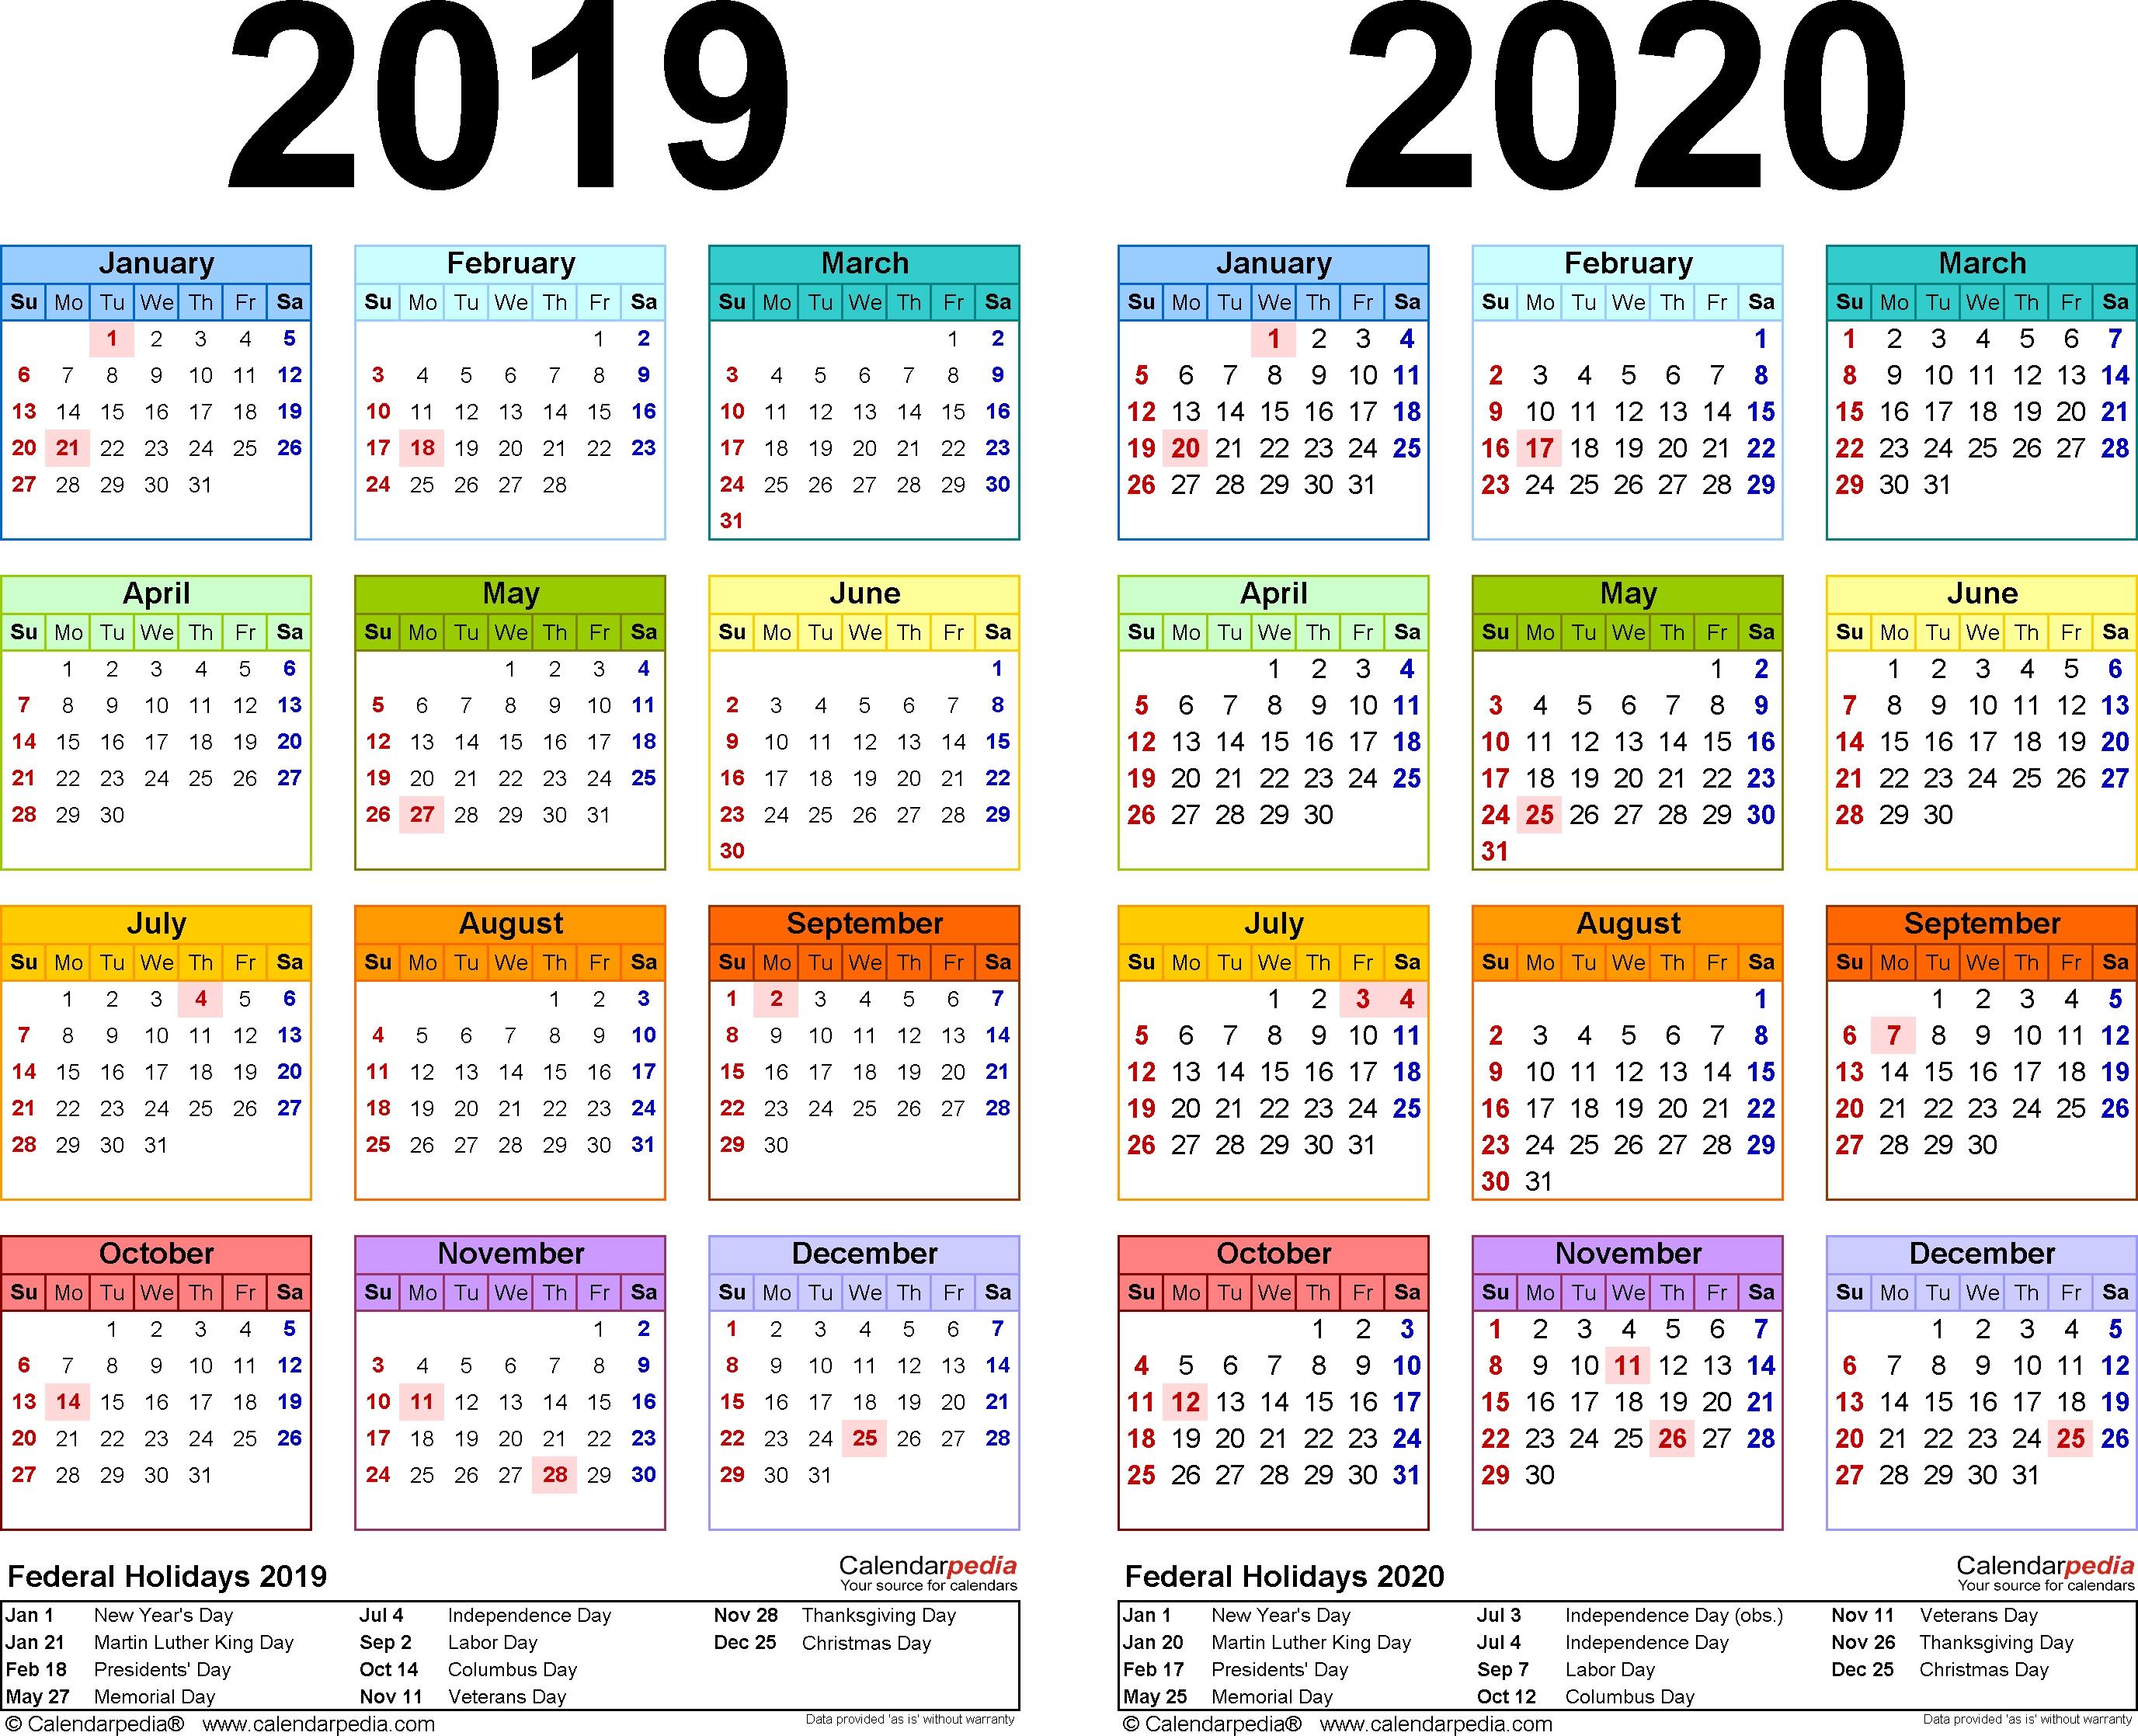 2019-2020 Calendar - Free Printable Two-Year Pdf Calendars for Calendar 365 2020 Printable